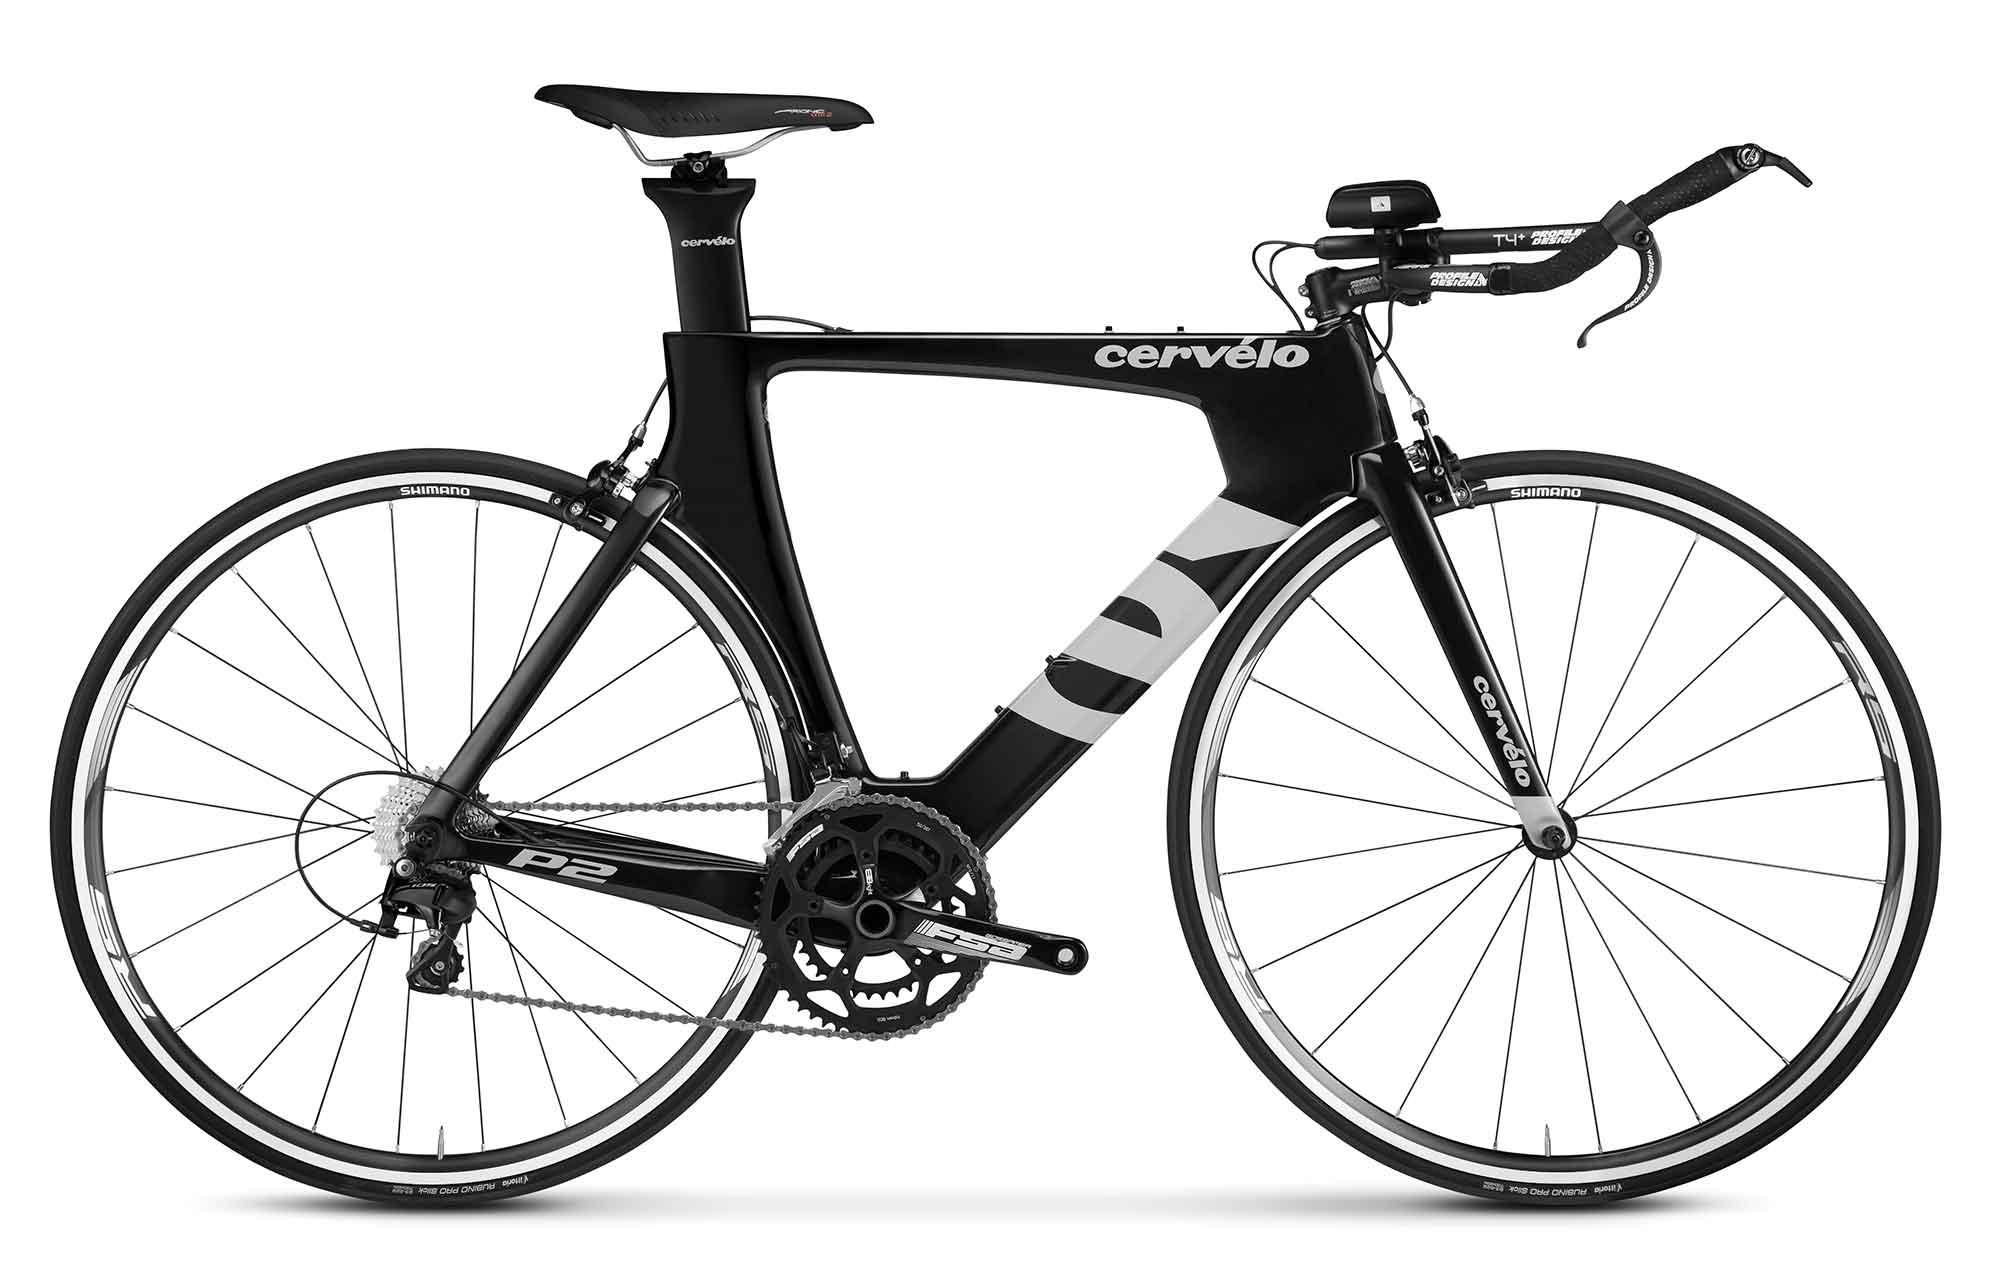 Cervelo P2 105 Bike R Amp A Cycles